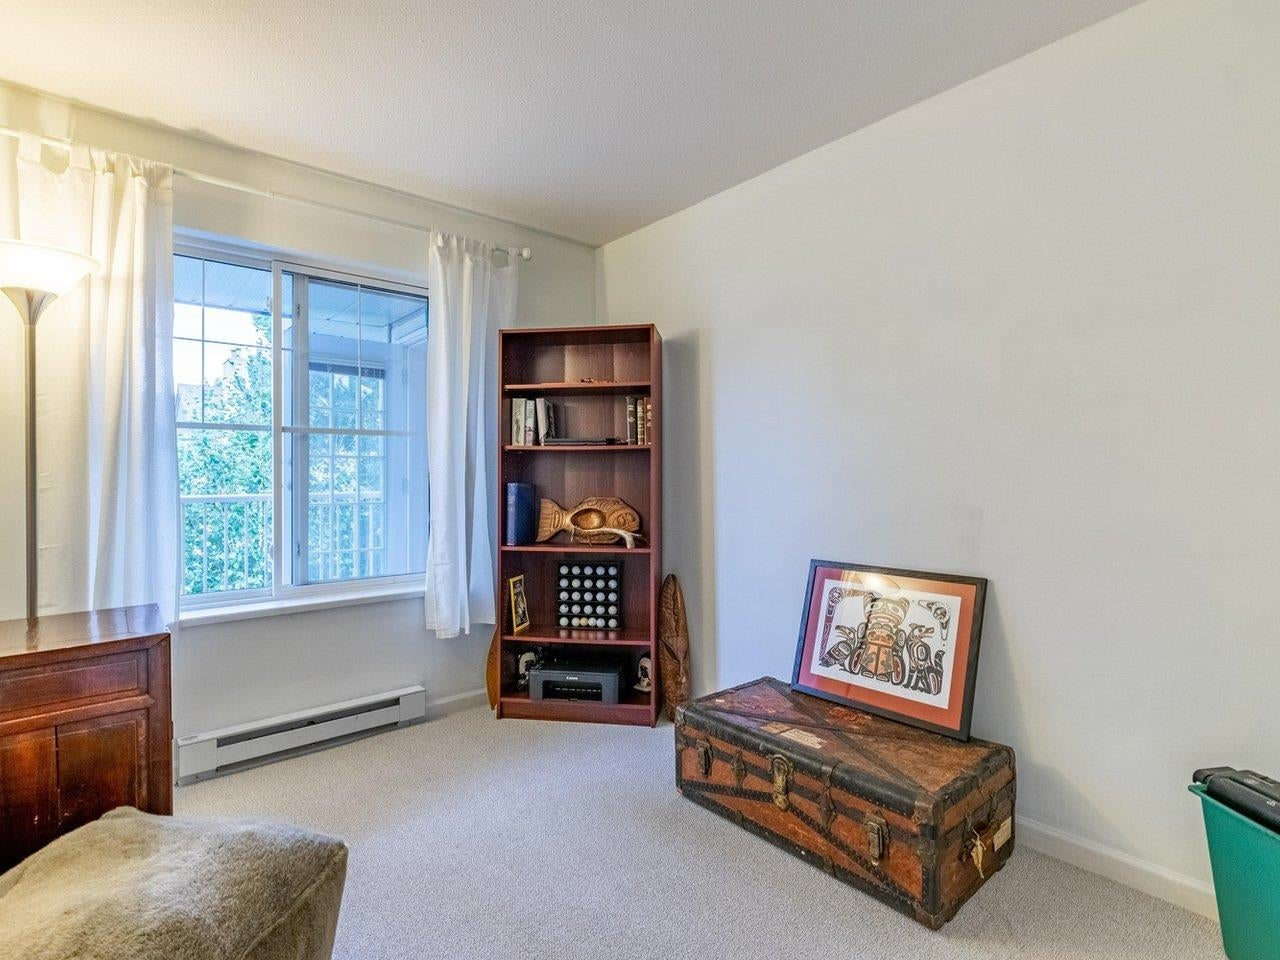 306 15298 20 AVENUE - King George Corridor Apartment/Condo for sale, 2 Bedrooms (R2625551) - #26